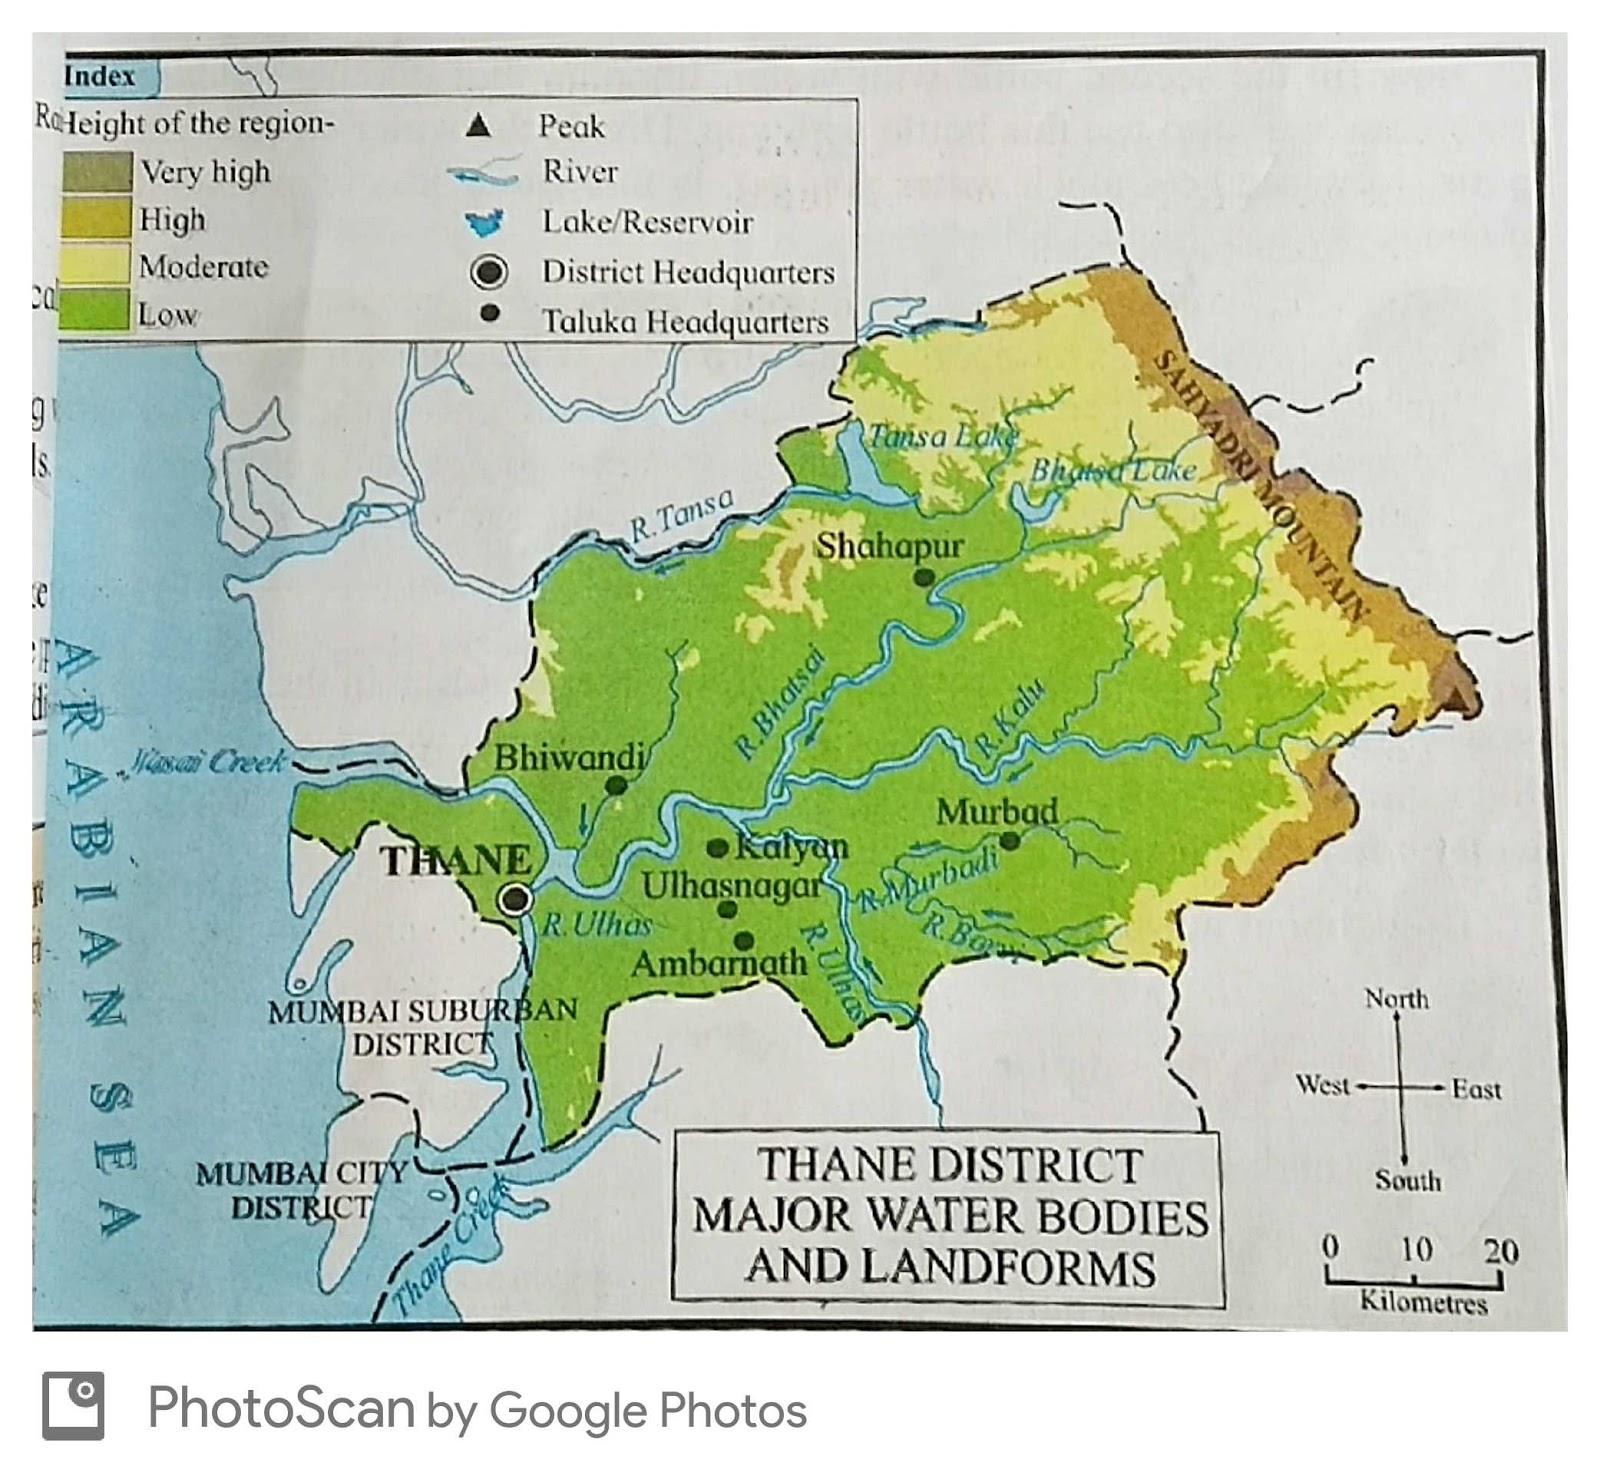 Worksheets Landforms And Bodies Of Water Worksheet evs worksheets chapter 9